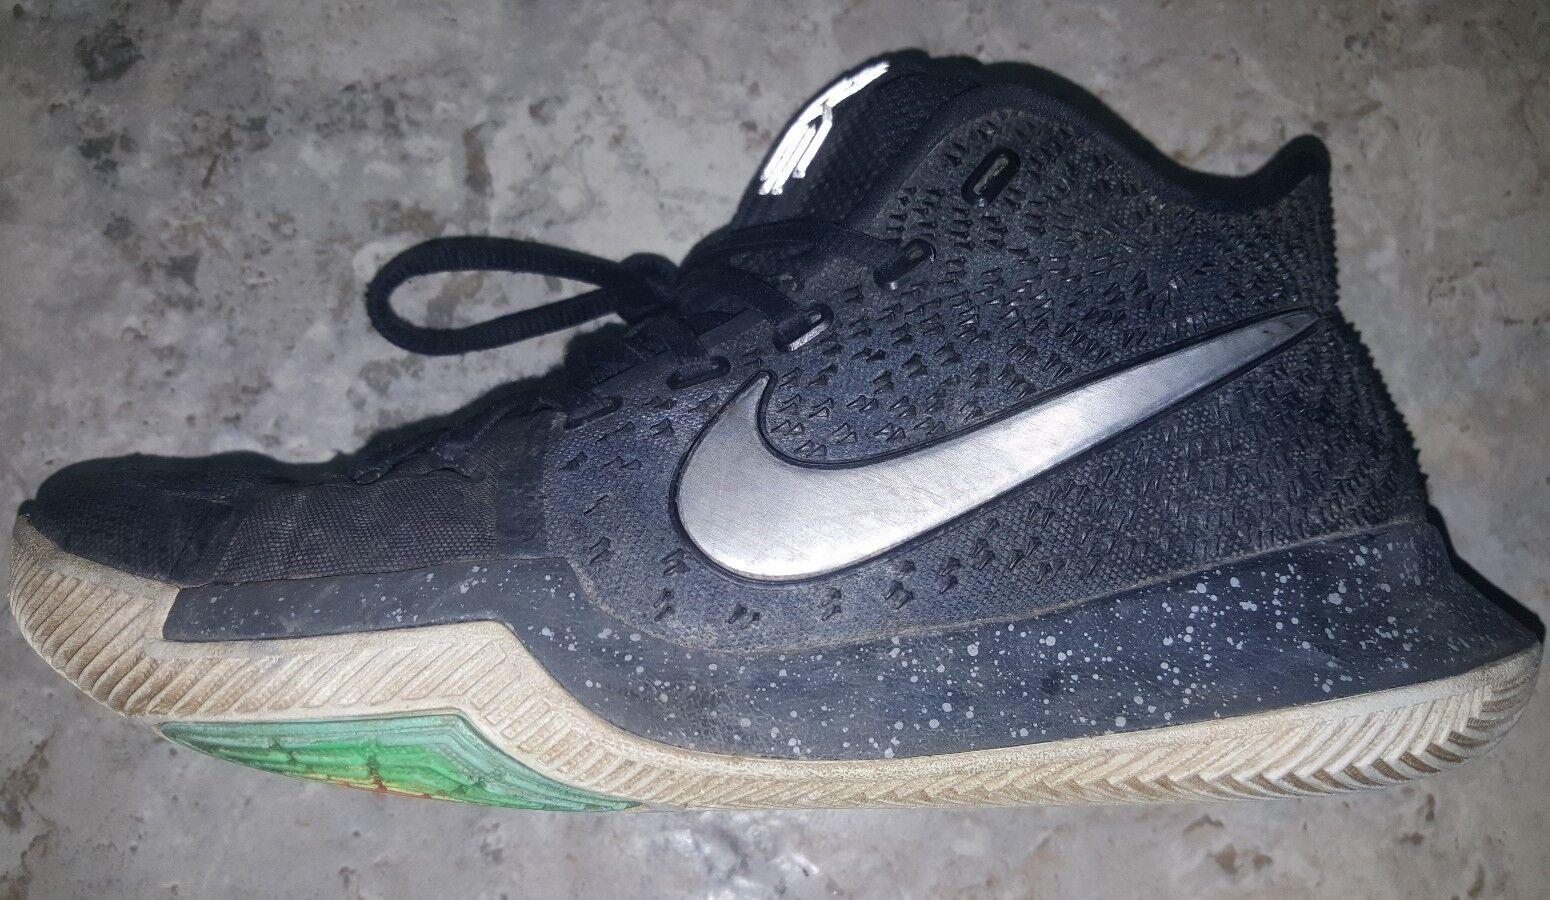 365f21d73c4d3a ... Nike Kyrie 3 Black Ice Silver White Shoes 852395 852395 852395 018  Men s US8.5